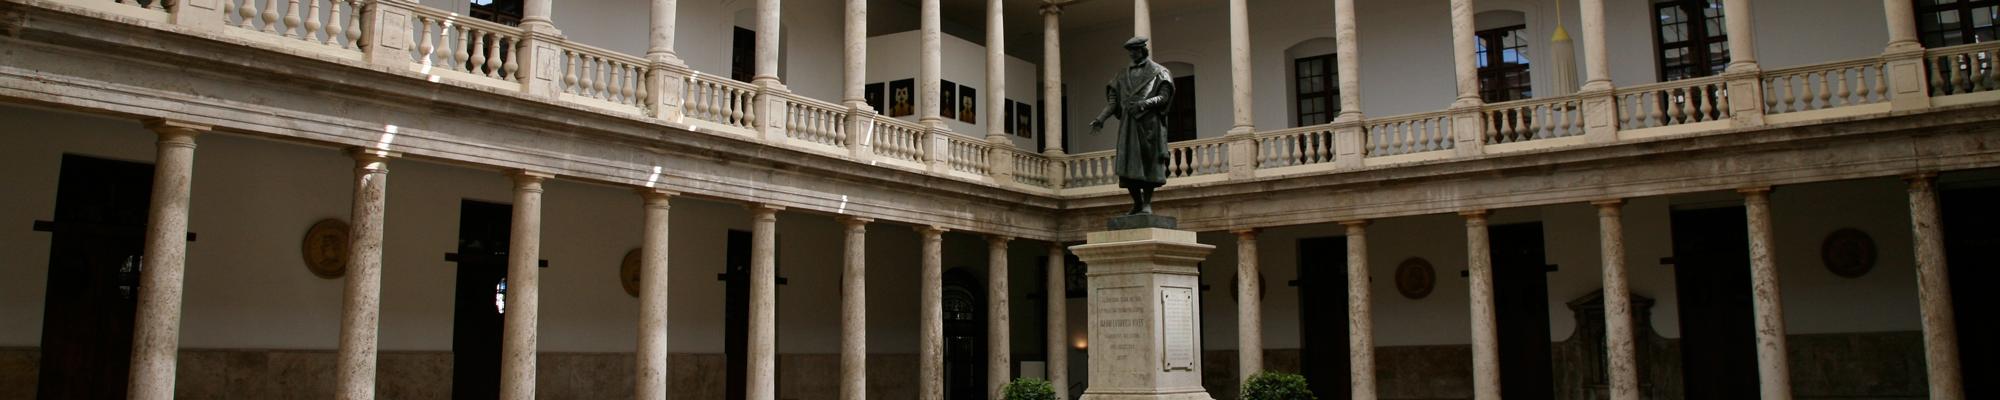 Claustro Universitat de València - Fundación Juan Esplugues